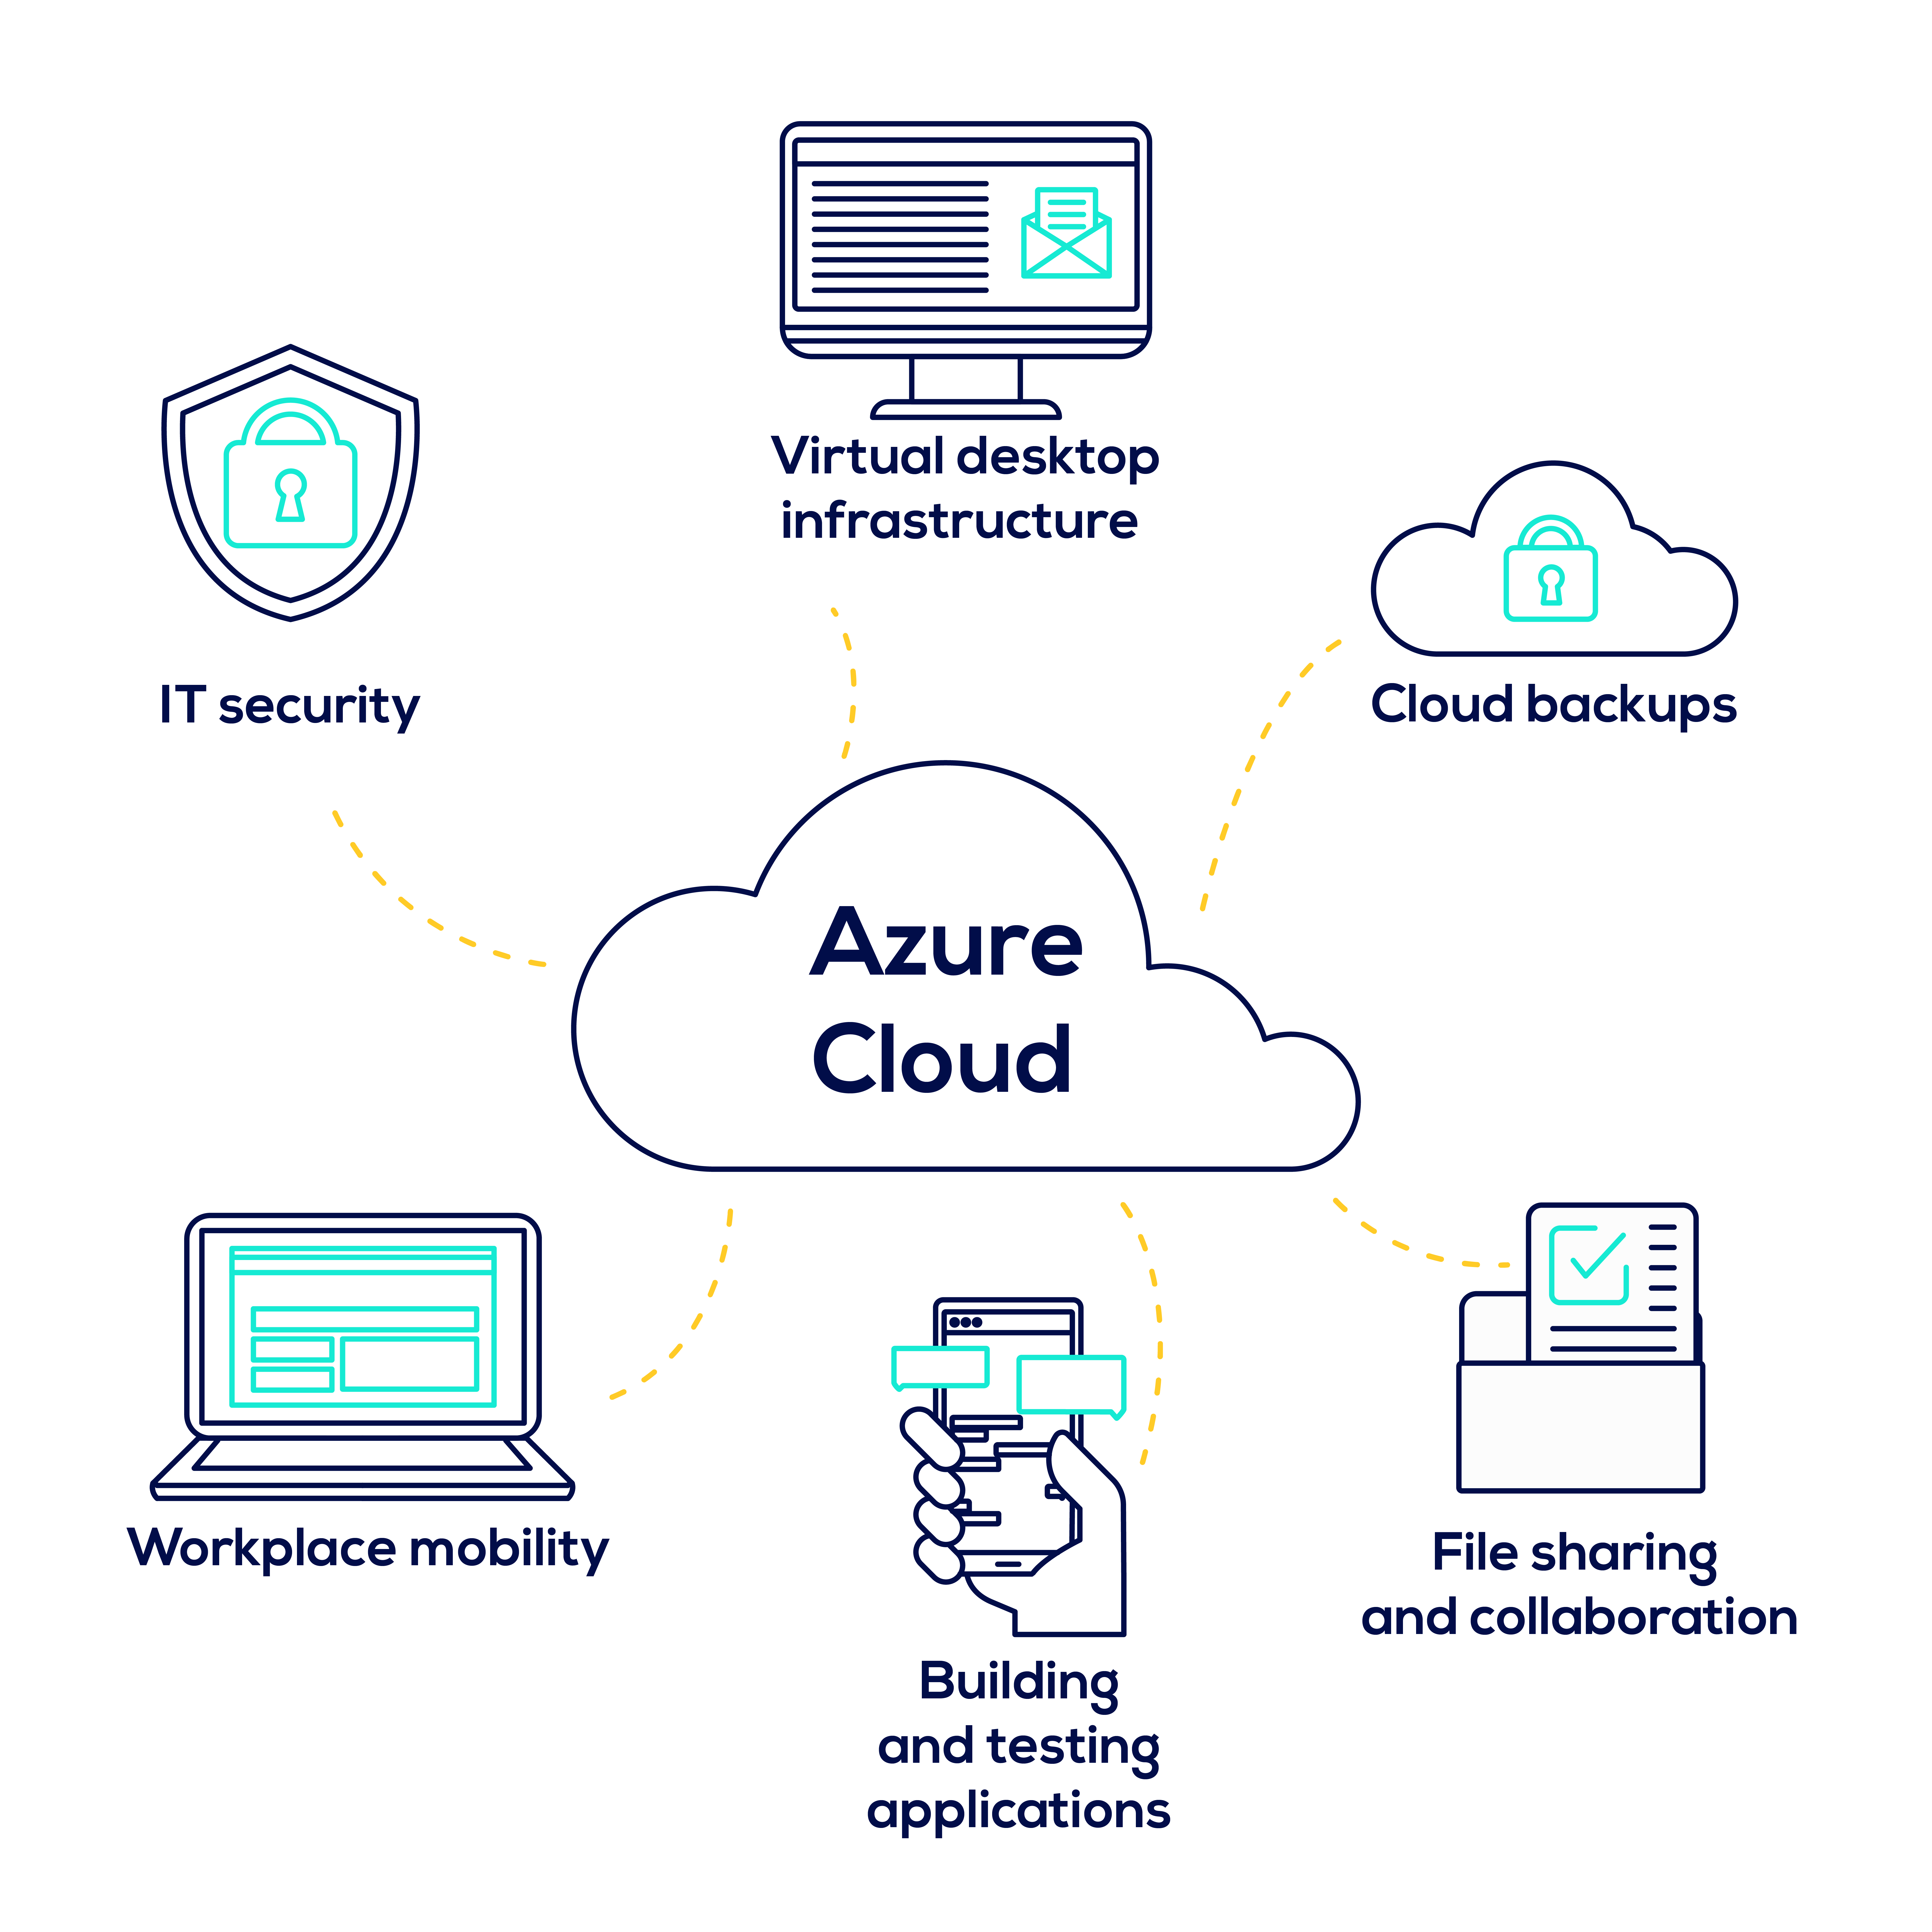 Azure cloud topic cluster